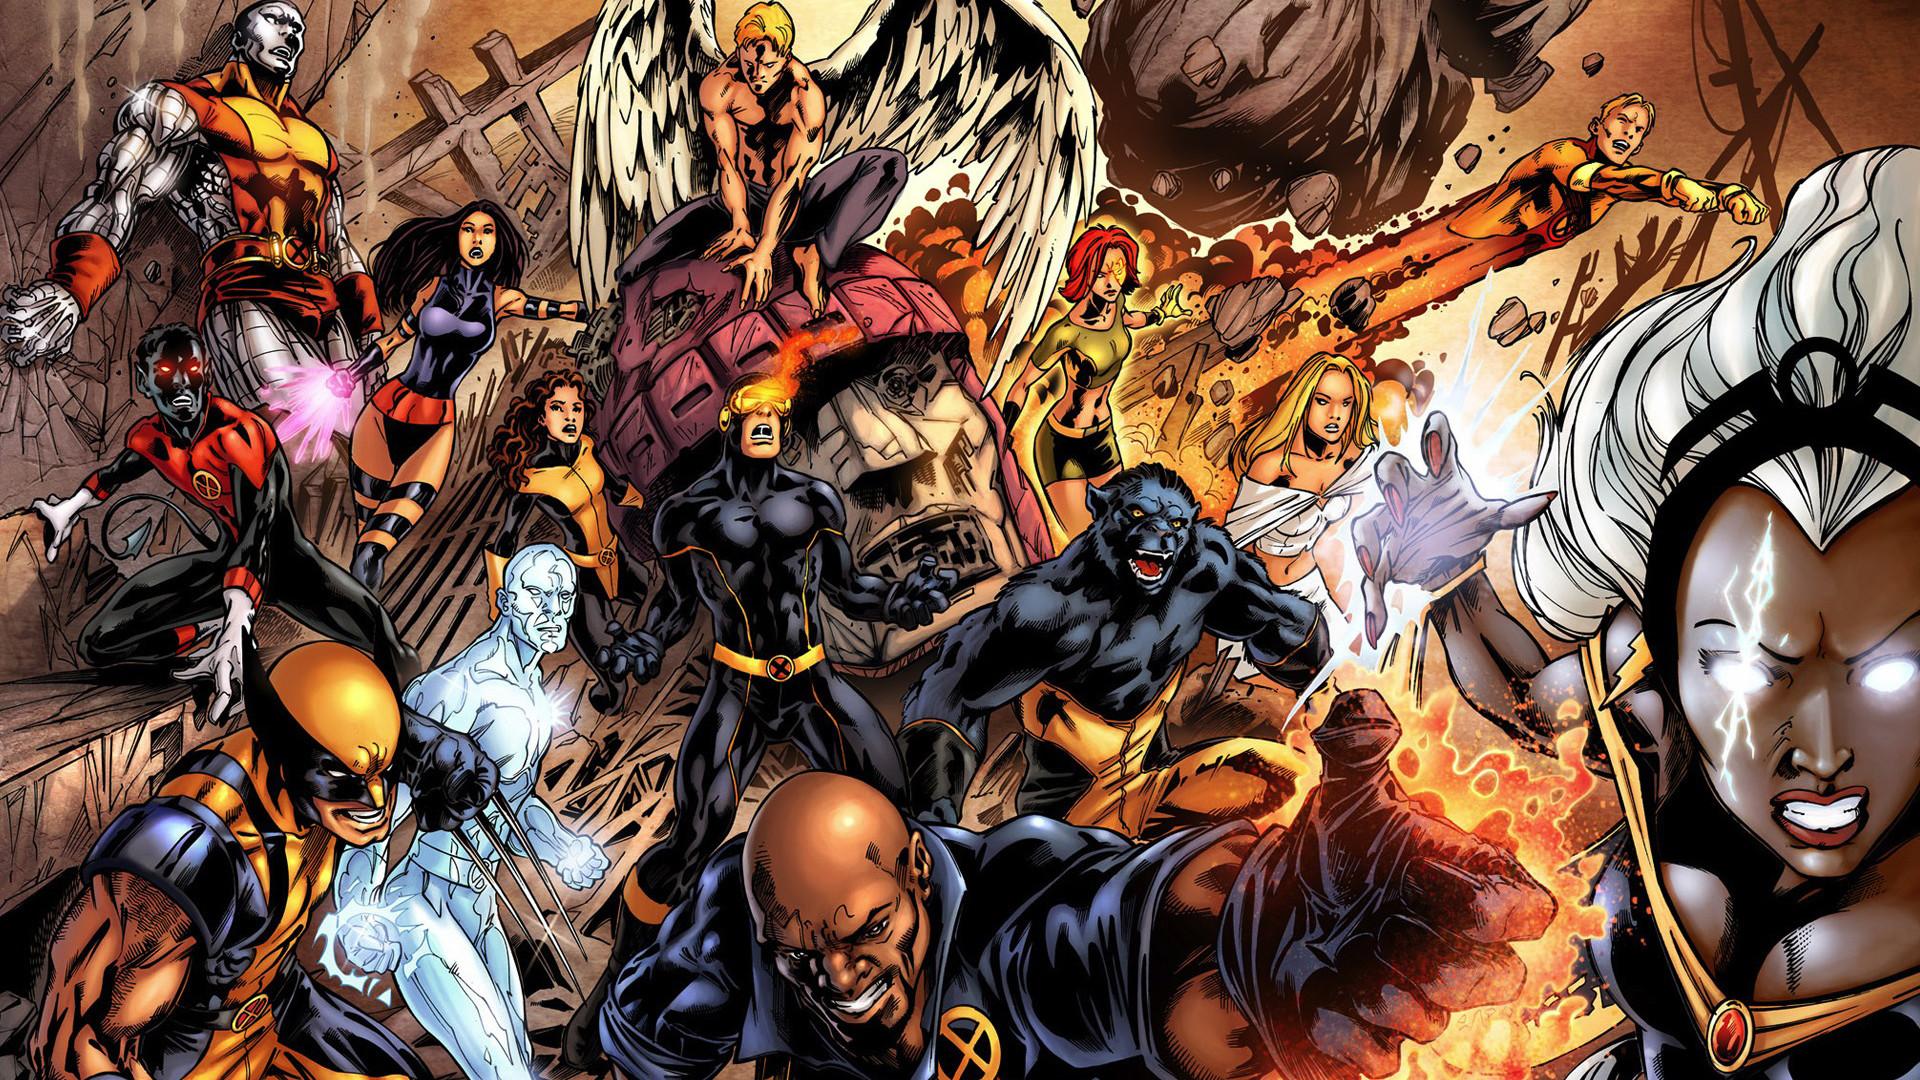 Marvel Comics Wallpaper Desktop Wallpapers (46+ Images